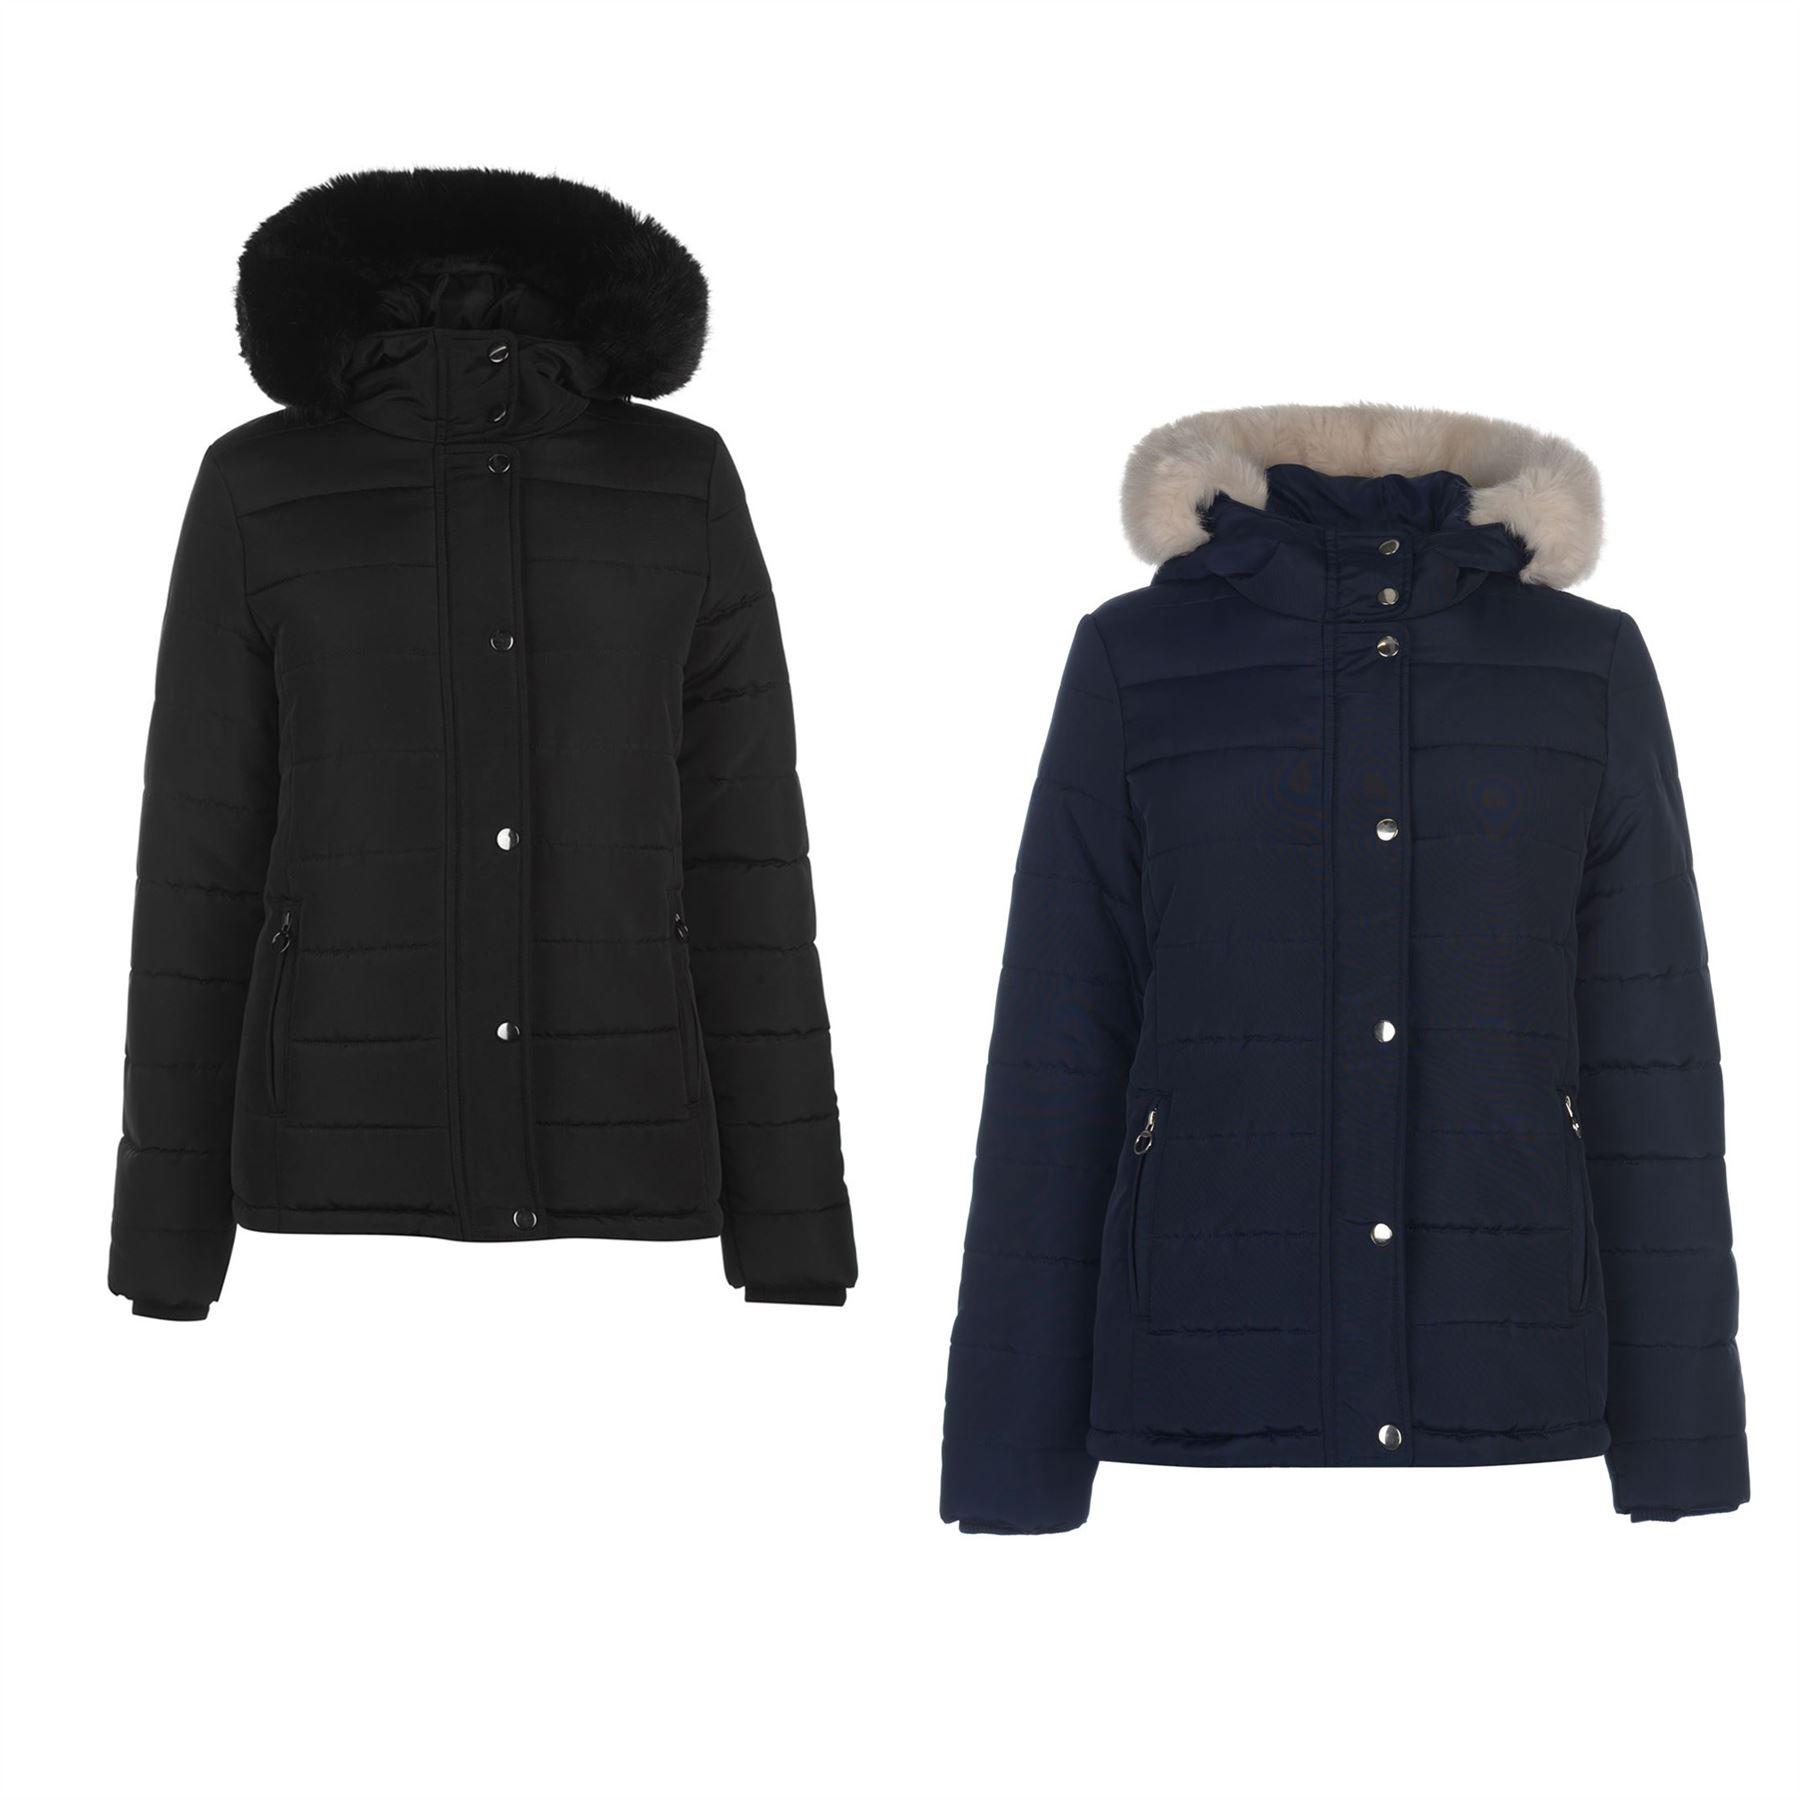 Details about Golddigga Bubble Jacket Womens Coats Outerwear Clothing